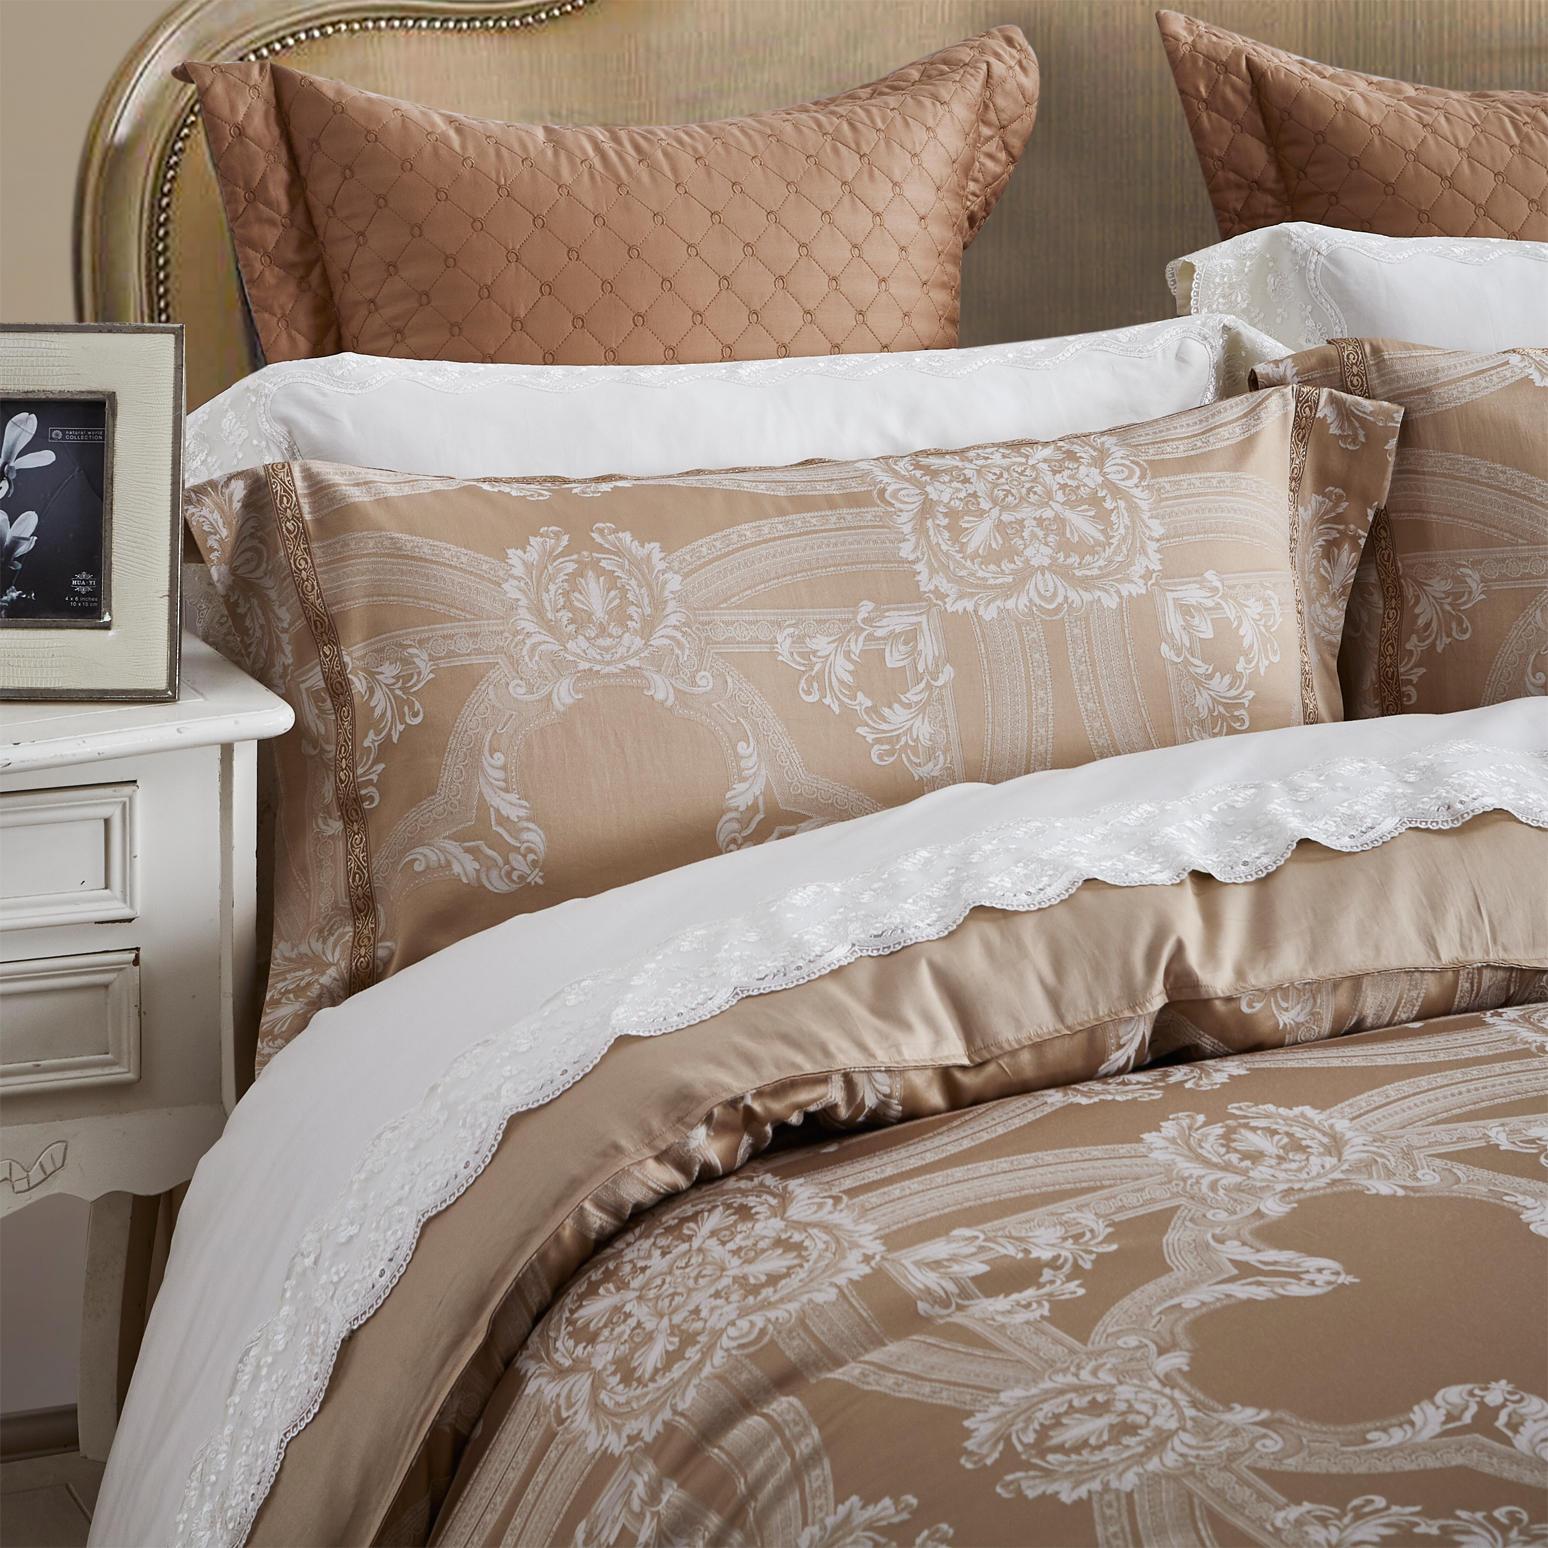 High Quality China Bedding Product Jacquard Sheet Set